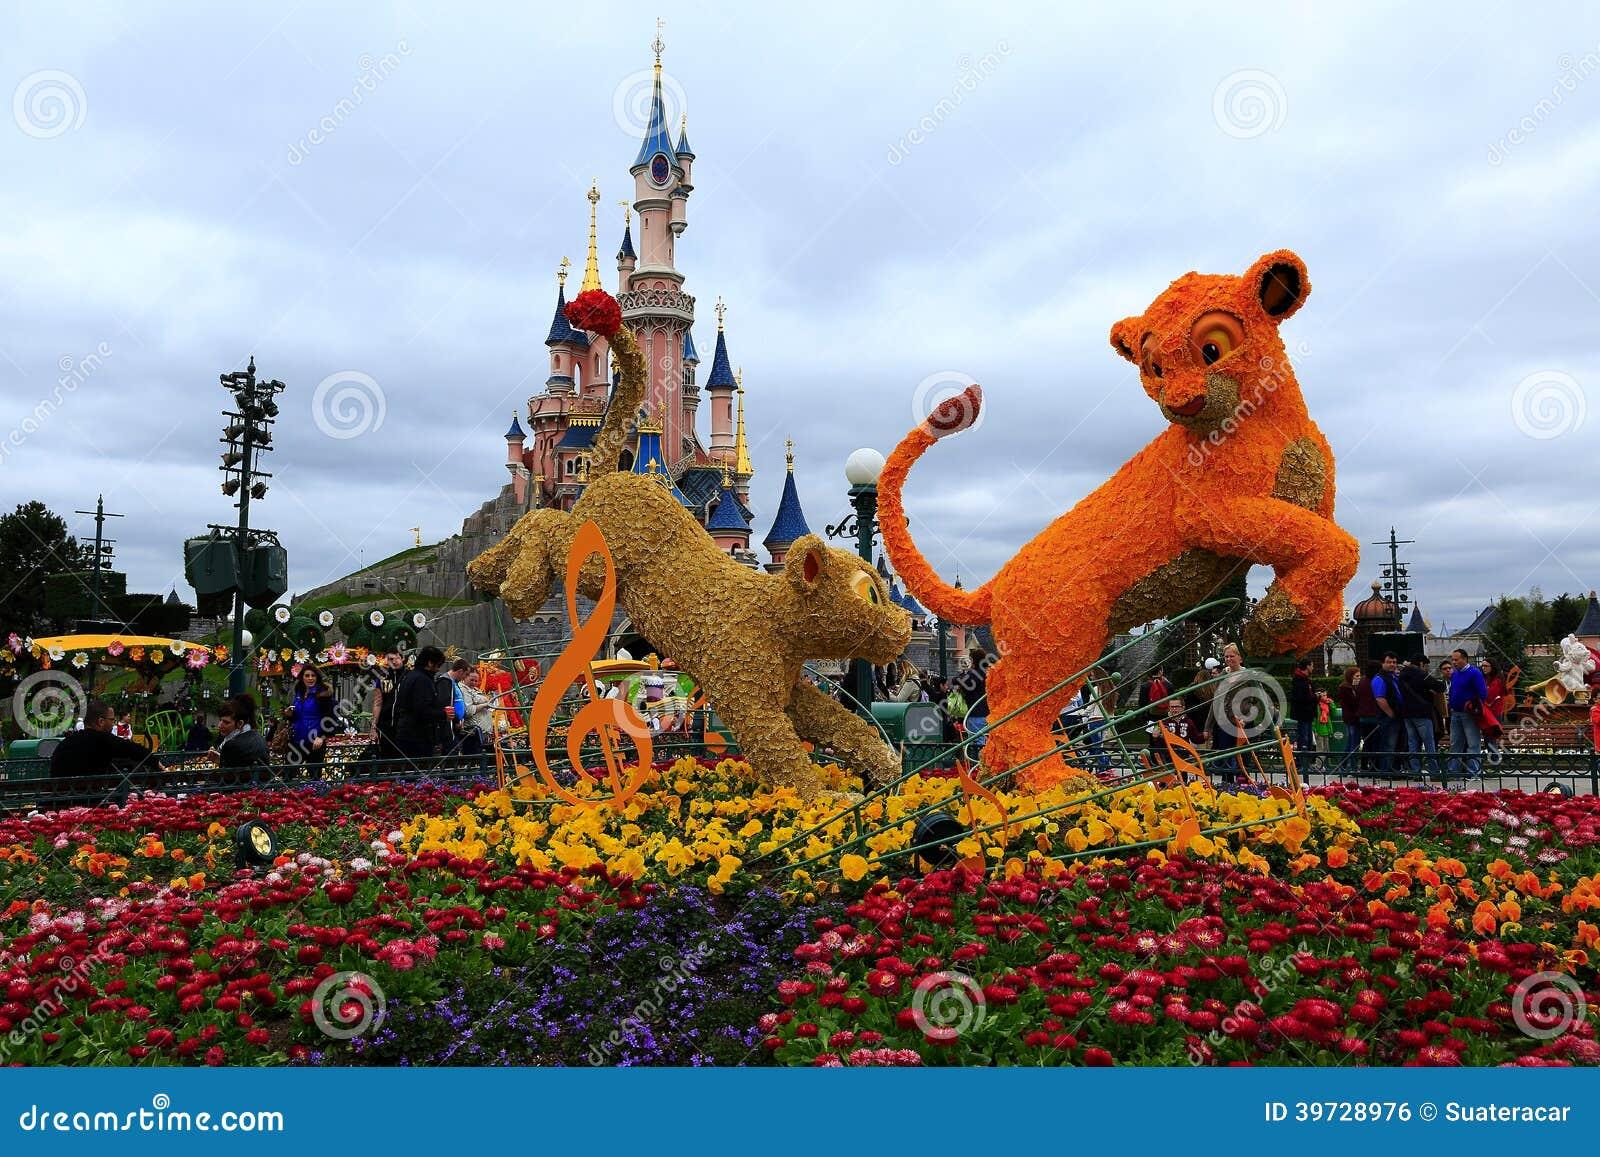 Disneyland, Paris Editorial Photo - Image: 39728976